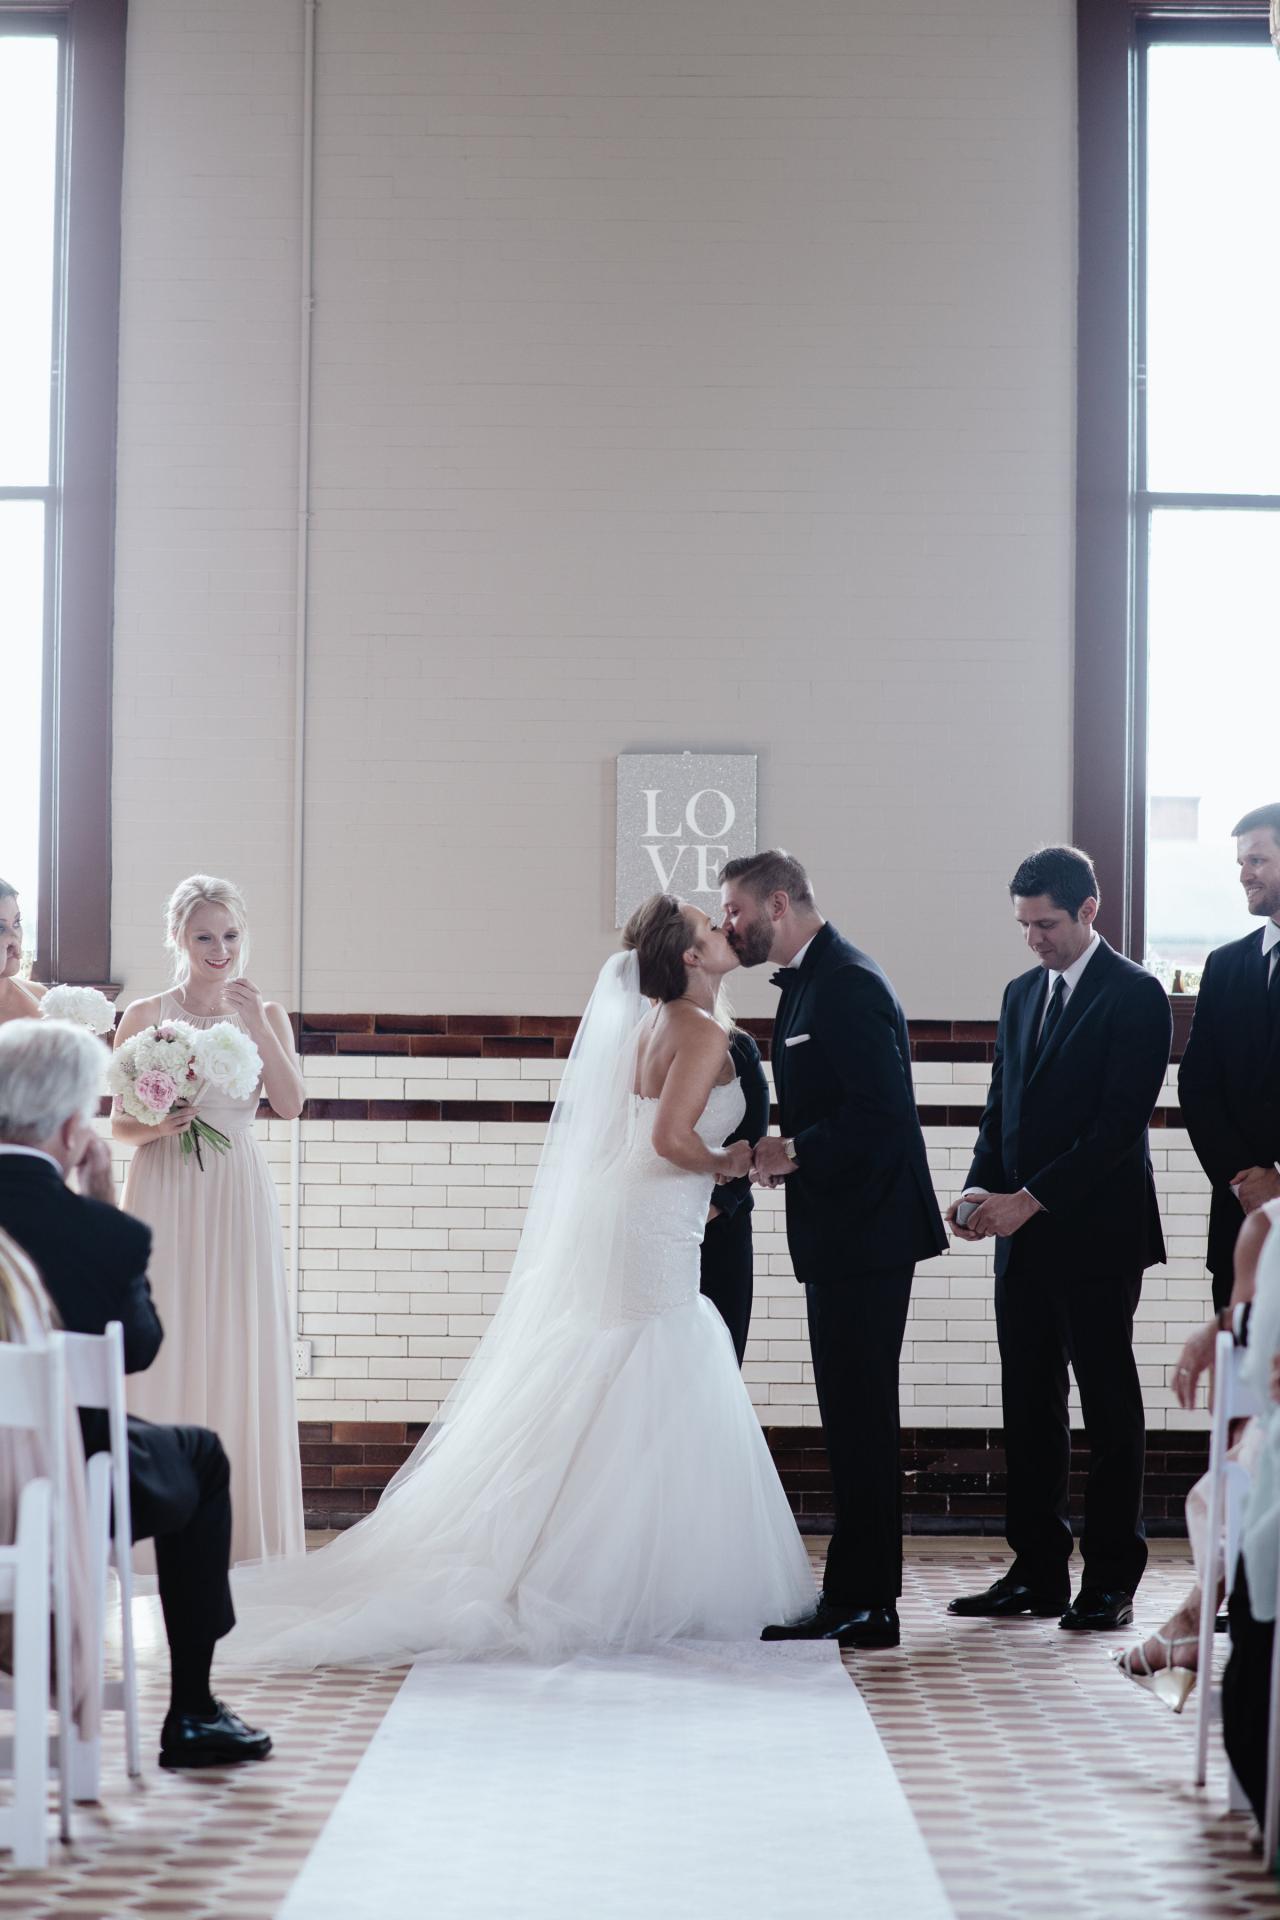 Photos from mina starsiak s summer wedding hgtv 39 s decorating design blog hgtv - Decorating shows ...